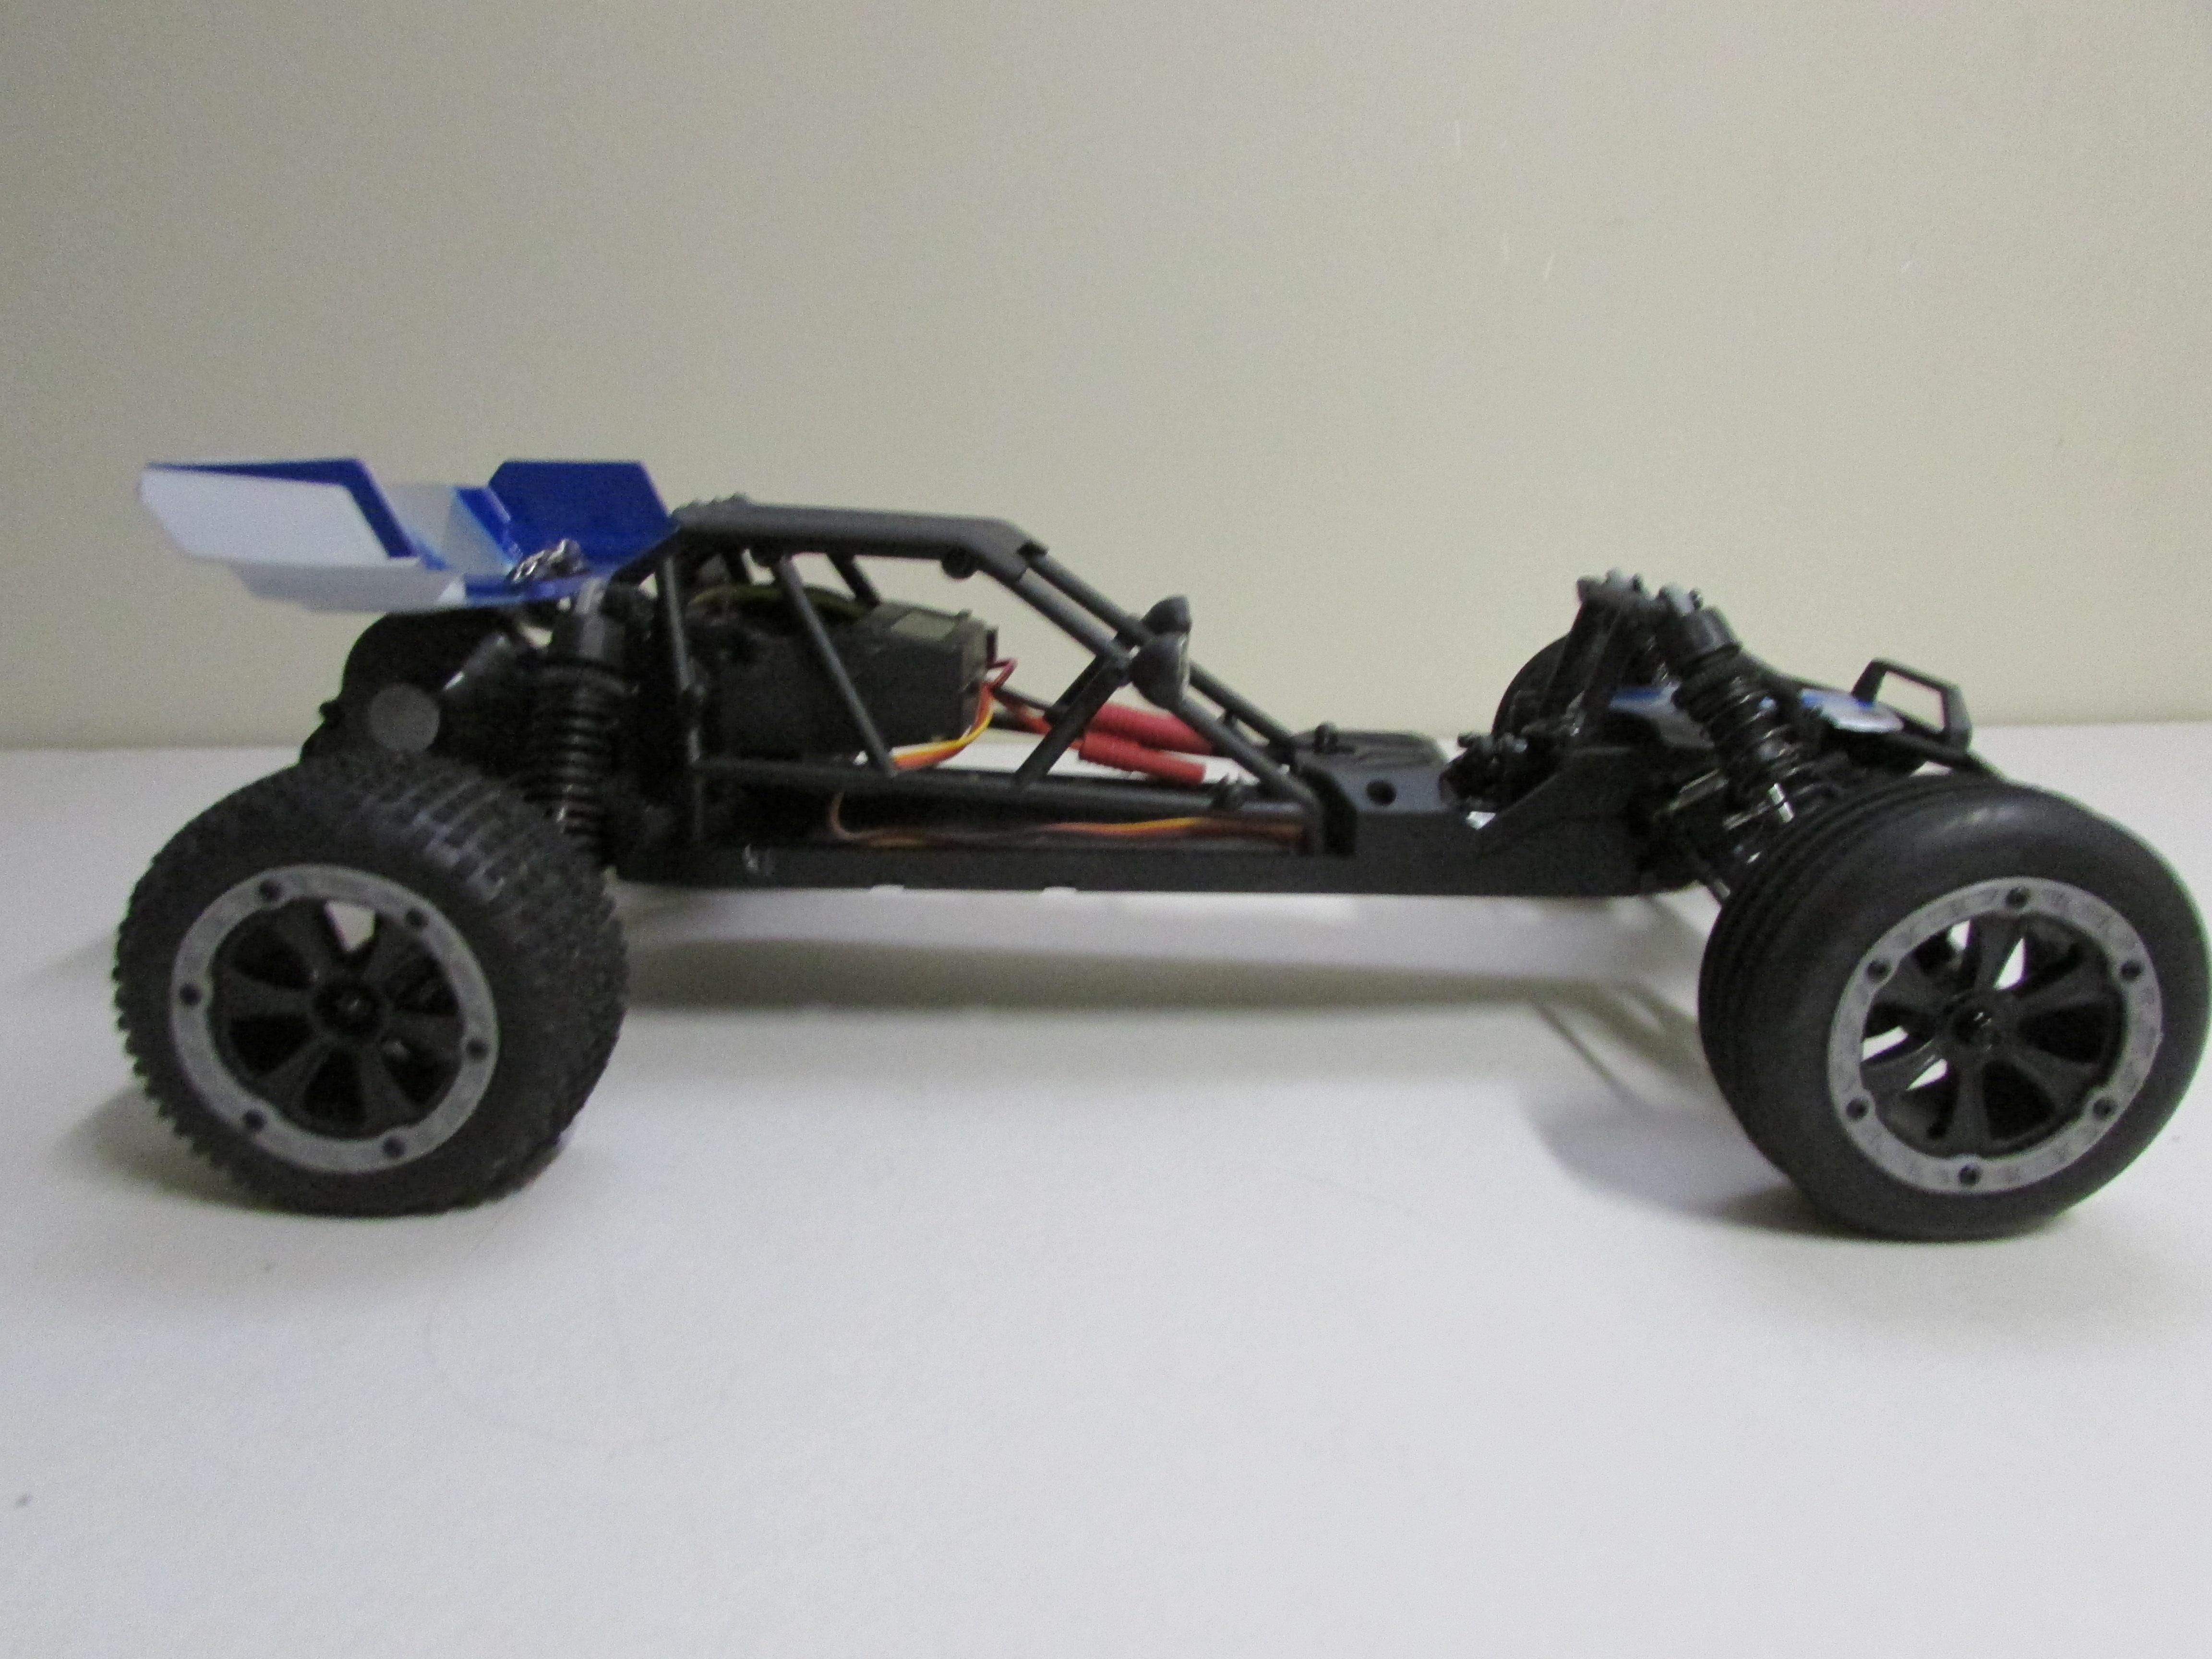 Redacat Racing Cyclone XB10 under 200 dollars